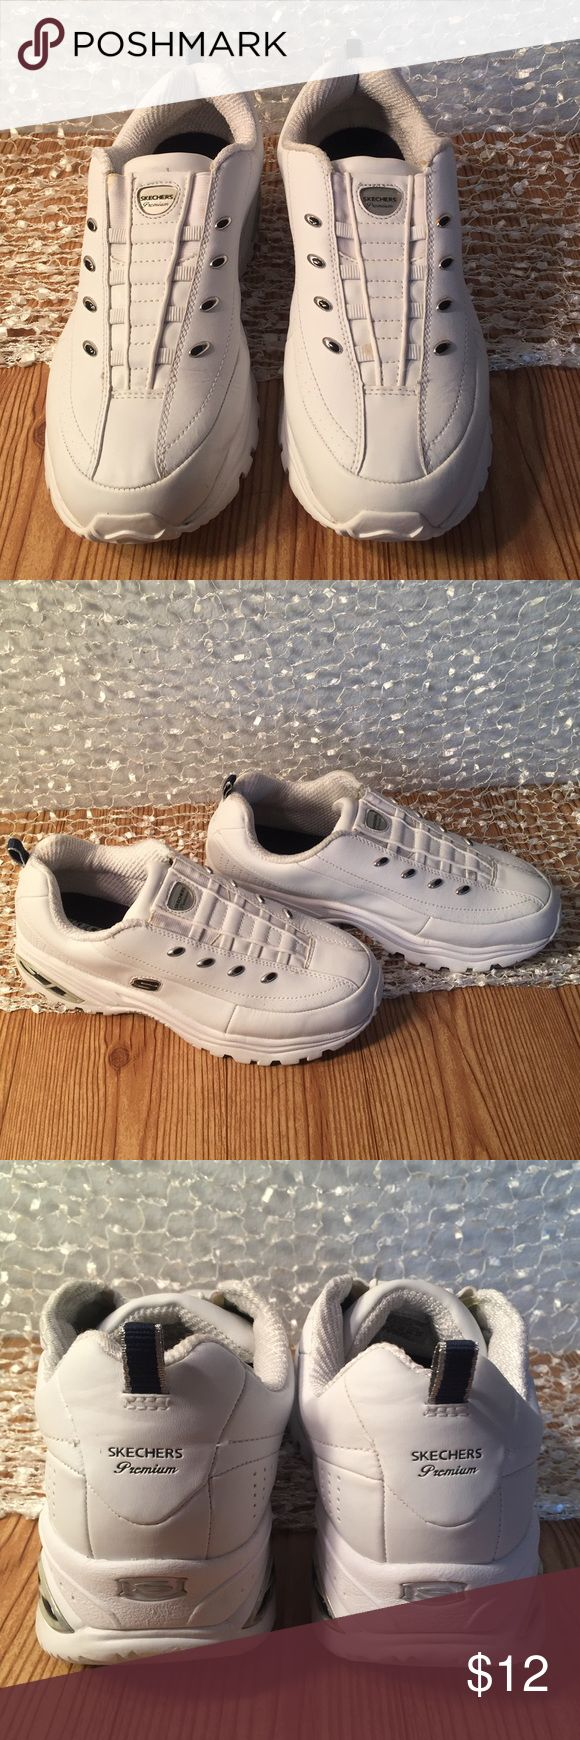 White Skechers Premium sport sneaker. Slip-on White Skechers Premium sport sneaker with silver and navy blue markings. Slip-on Gently used. Size 9 Skechers Shoes Sneakers